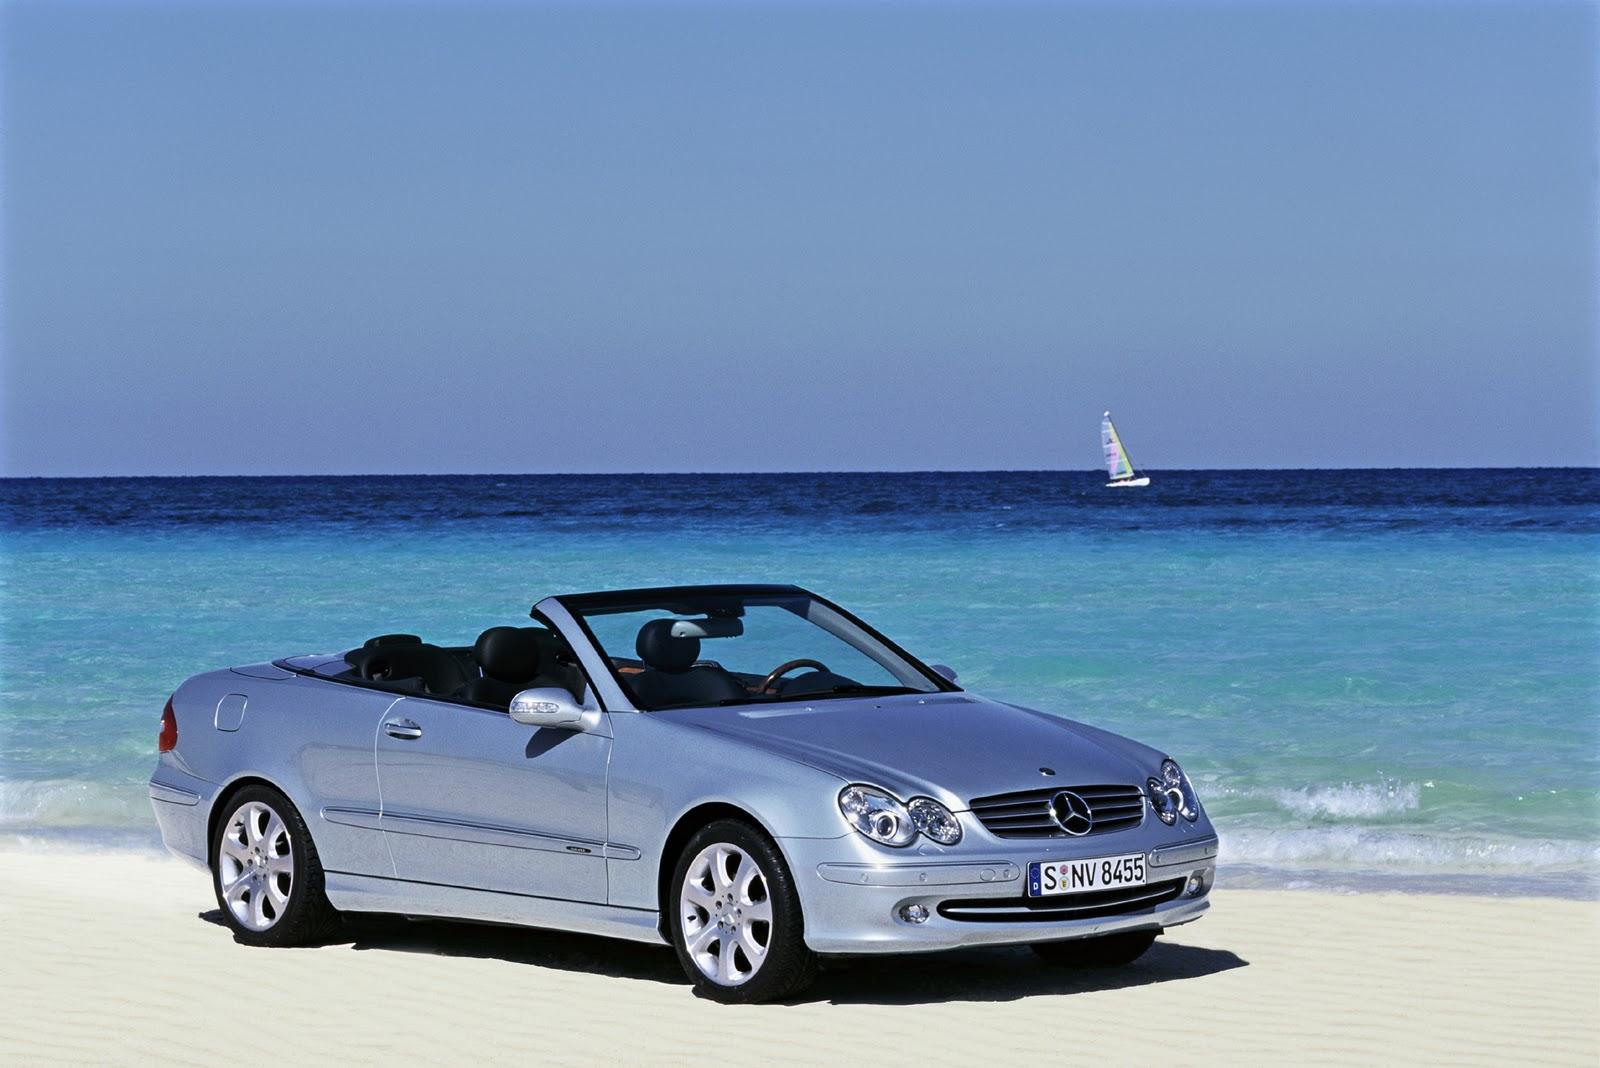 http://3.bp.blogspot.com/-1uQUC1BuWKc/TqRCReY-UsI/AAAAAAAAAS0/YmpW1n_FKBI/s1600/Foto40_Mercedes_Benz_CLK_Cabriolet.jpg